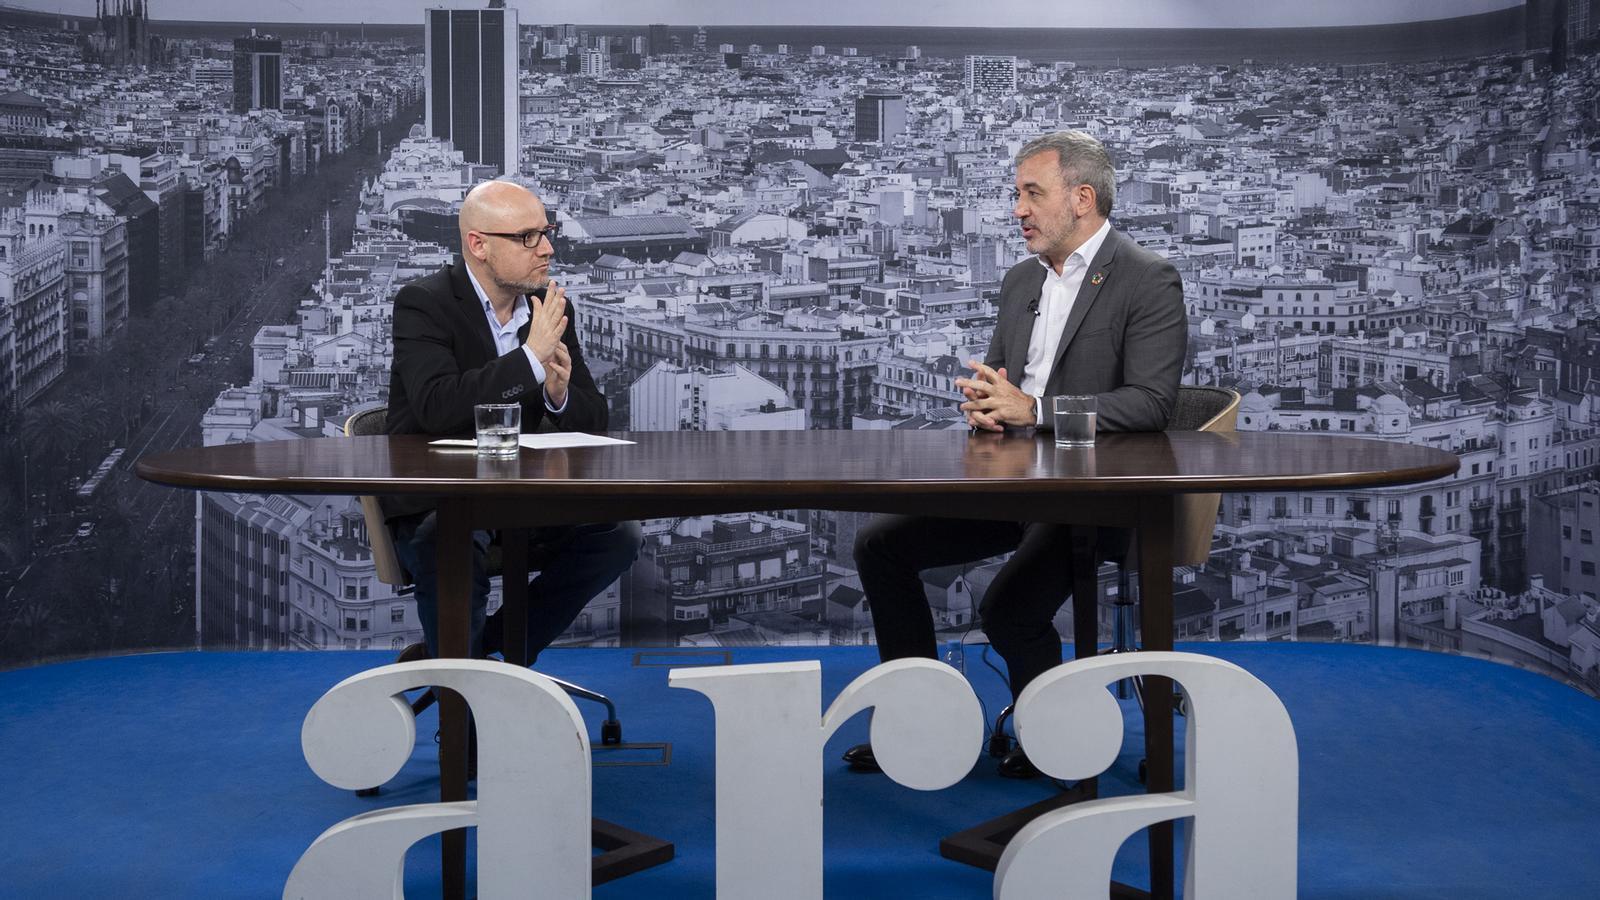 Entrevista de David Miró a Jaume Collboni